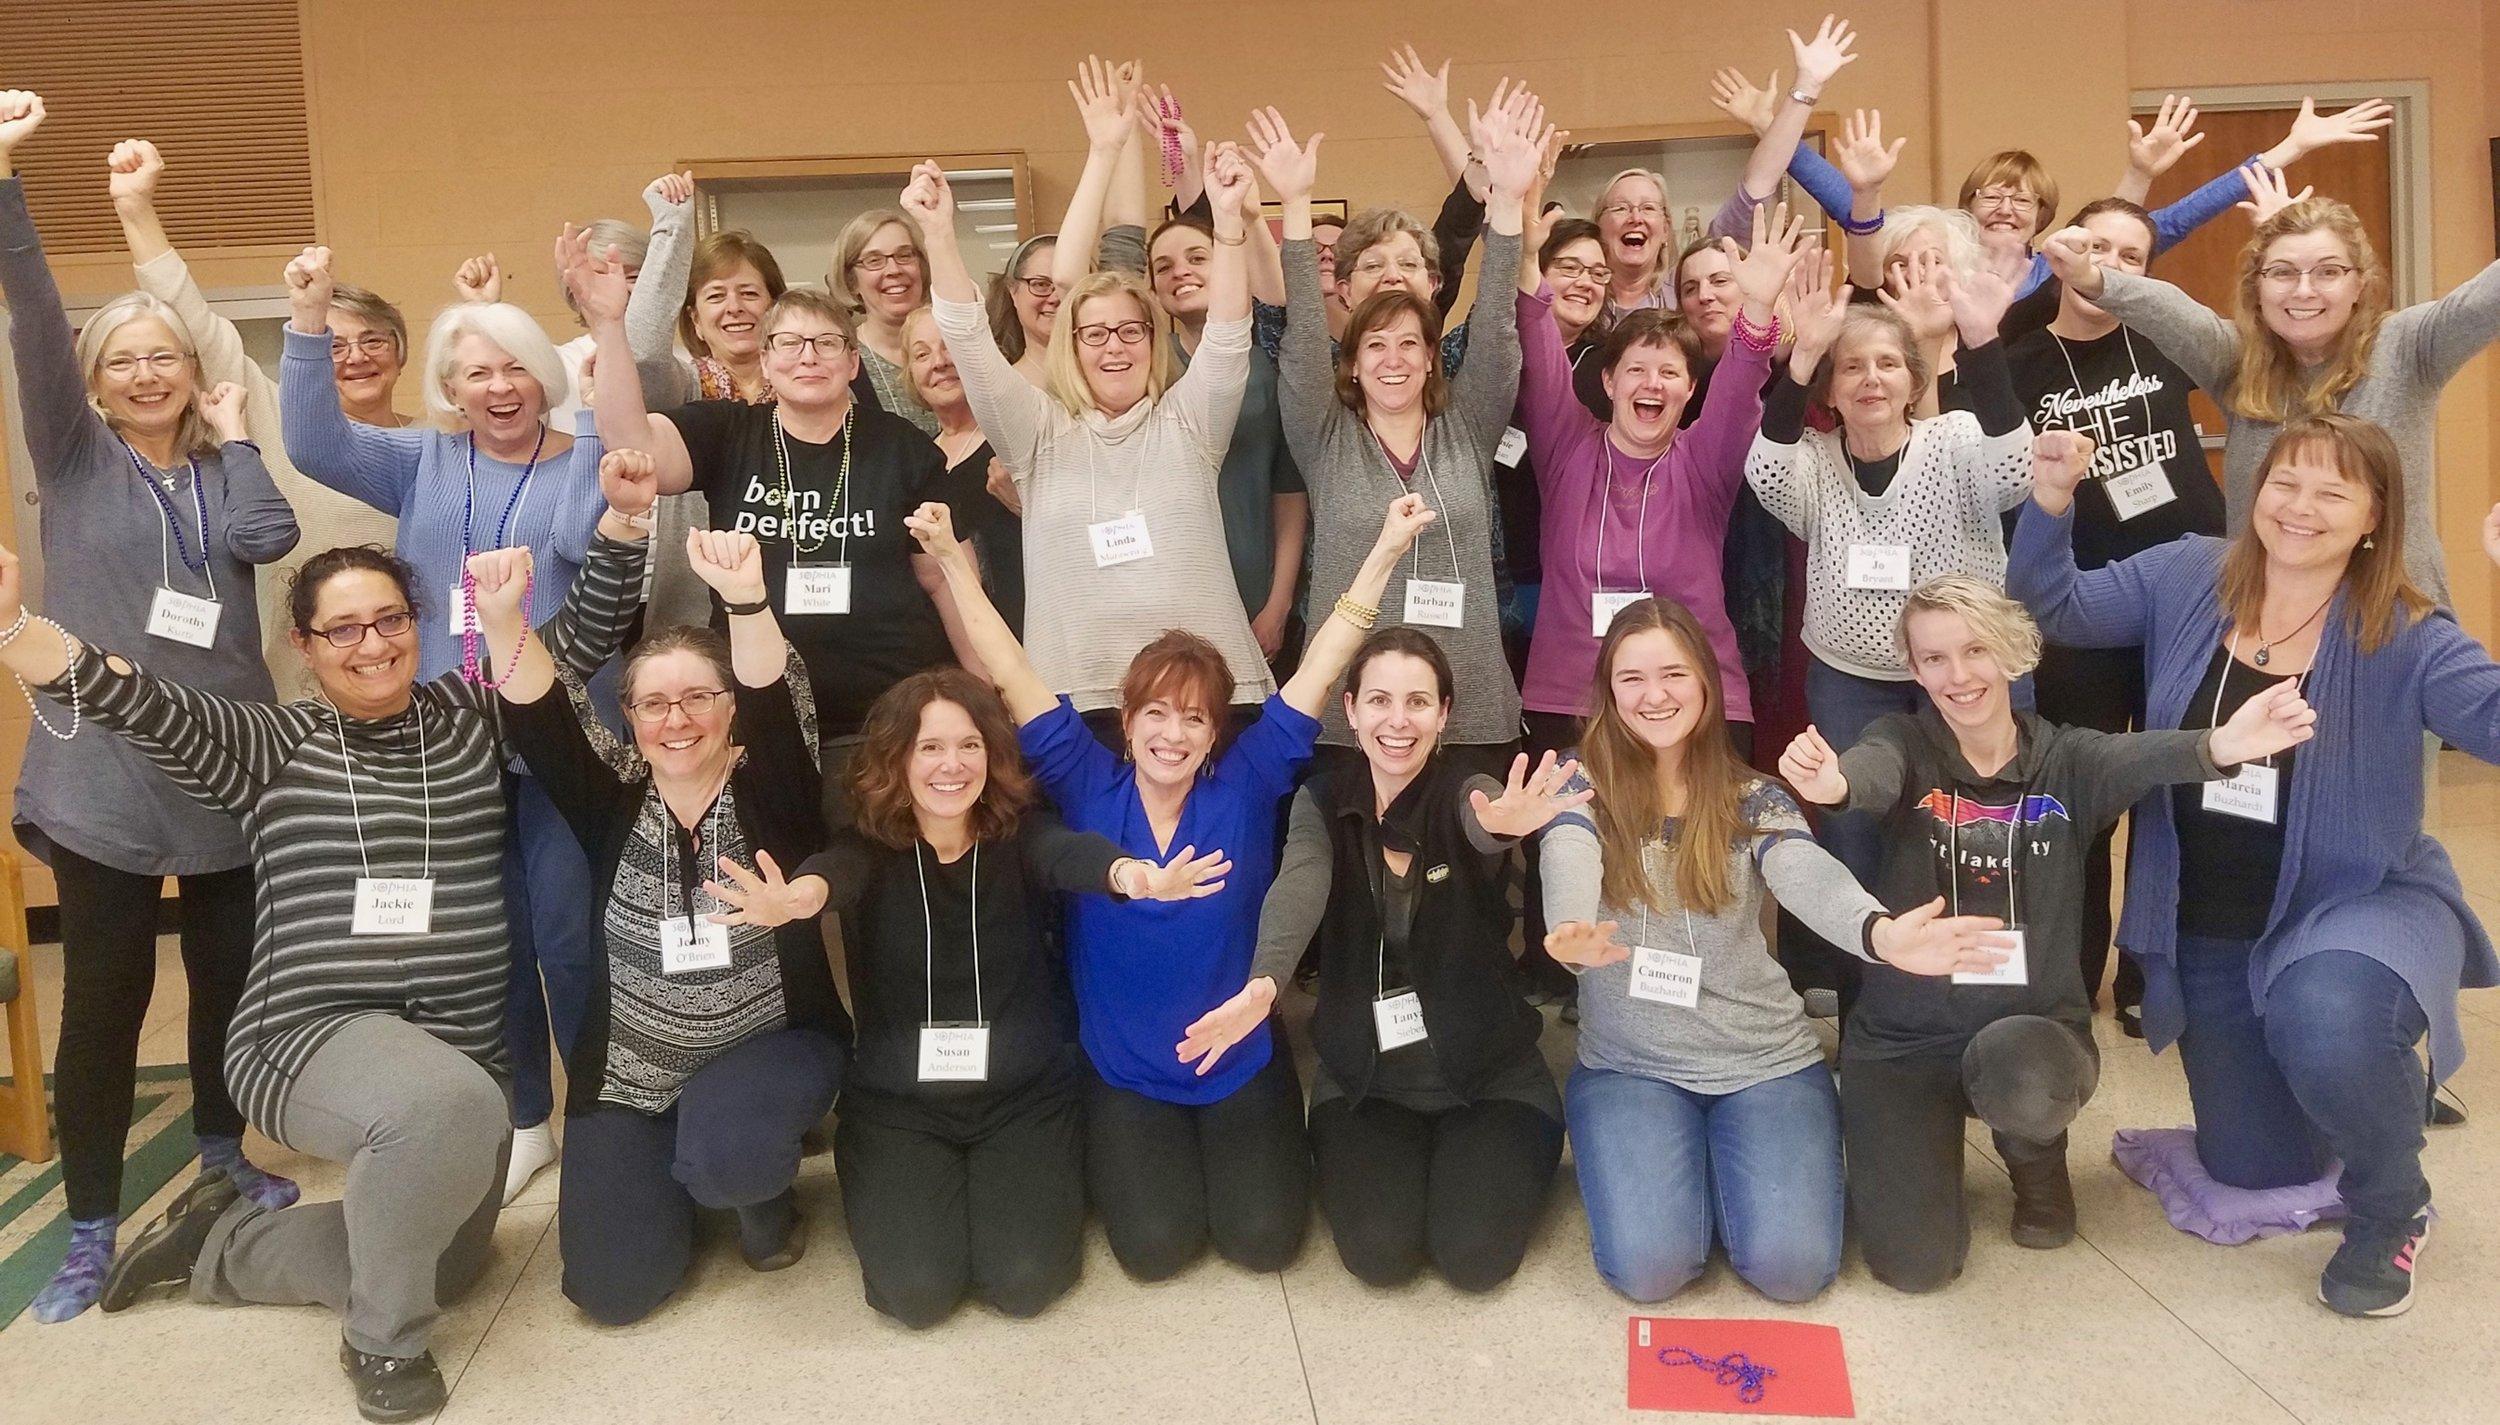 Plymouth Women's Retreat - February, 2019